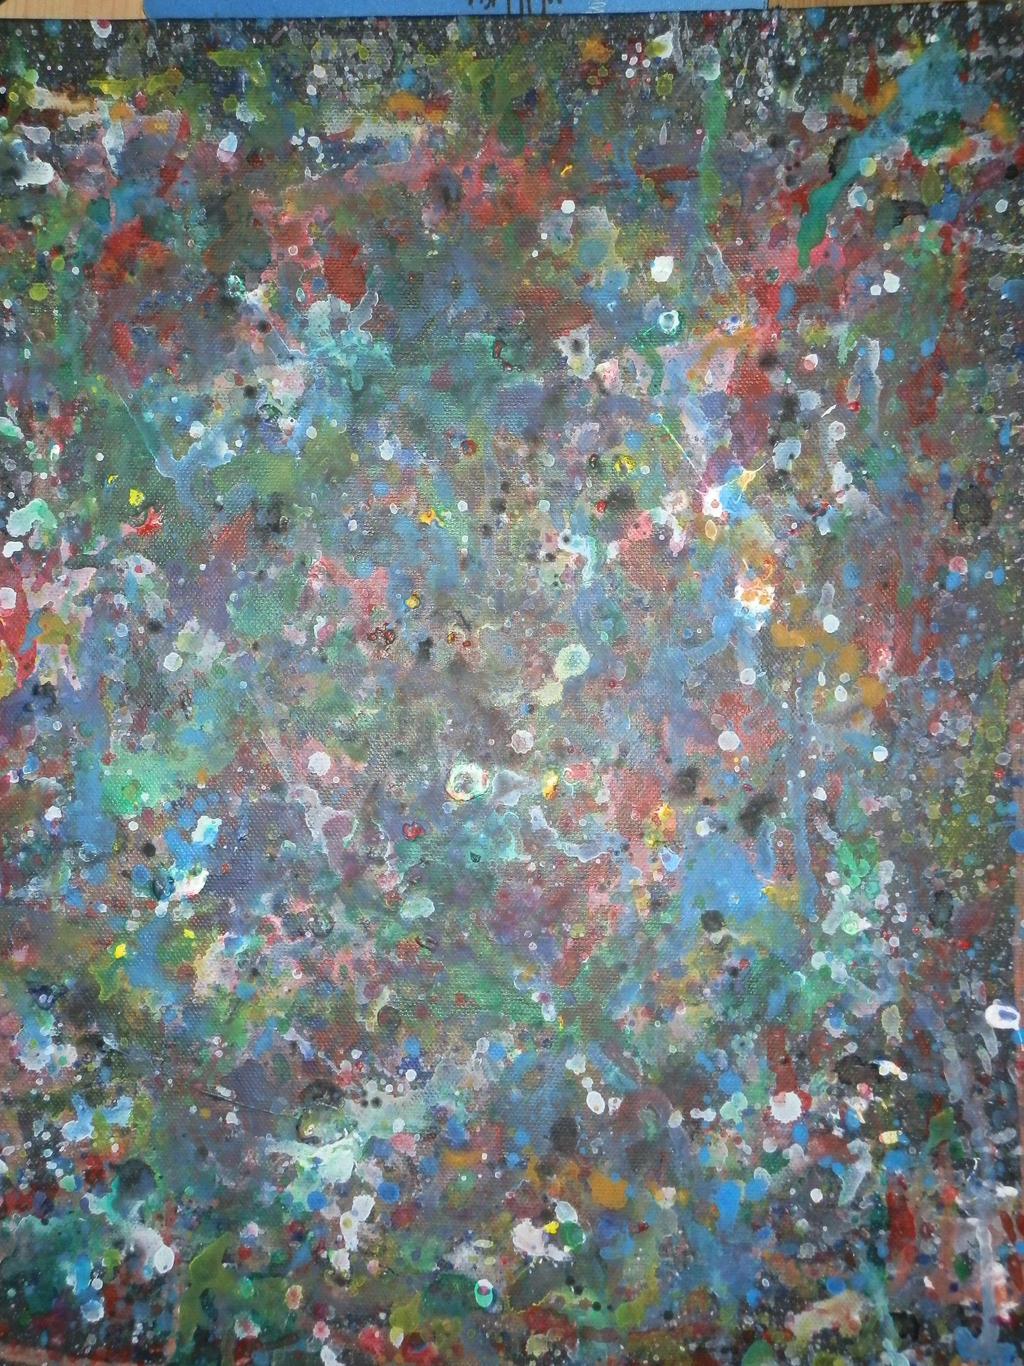 Colorful space by ArttuJokela